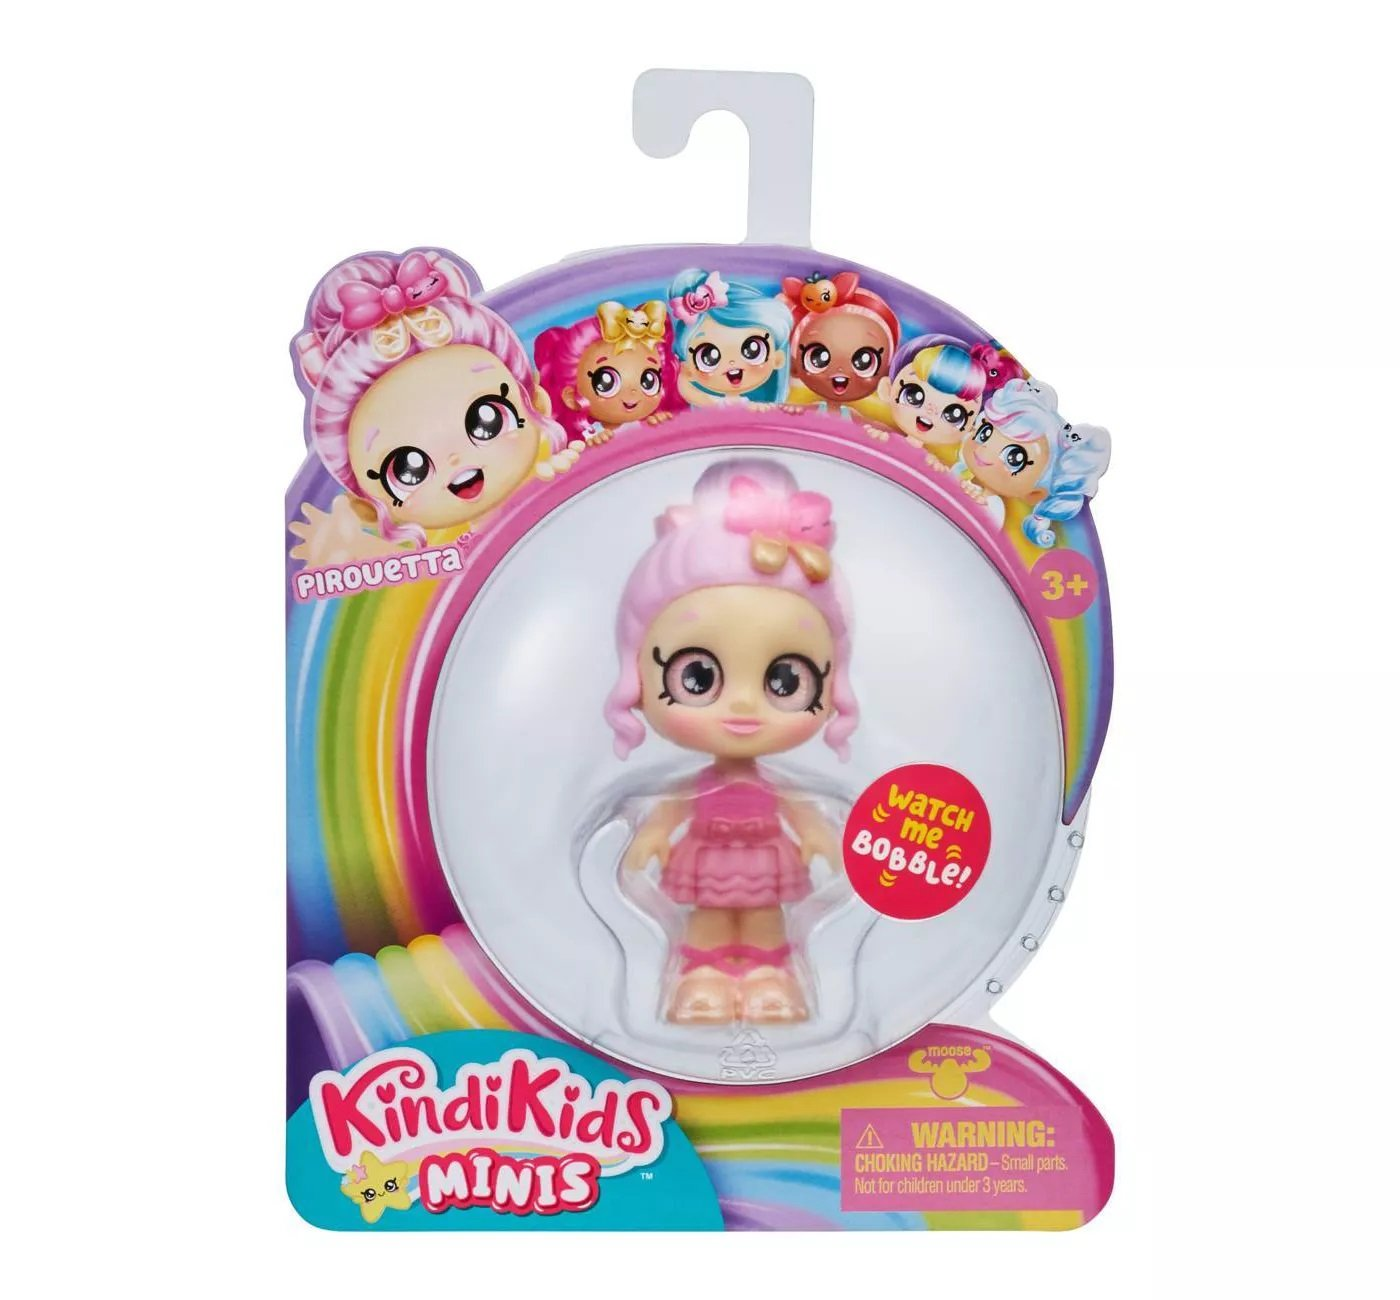 Kindi Kids Minis 娃娃 Pirouetta